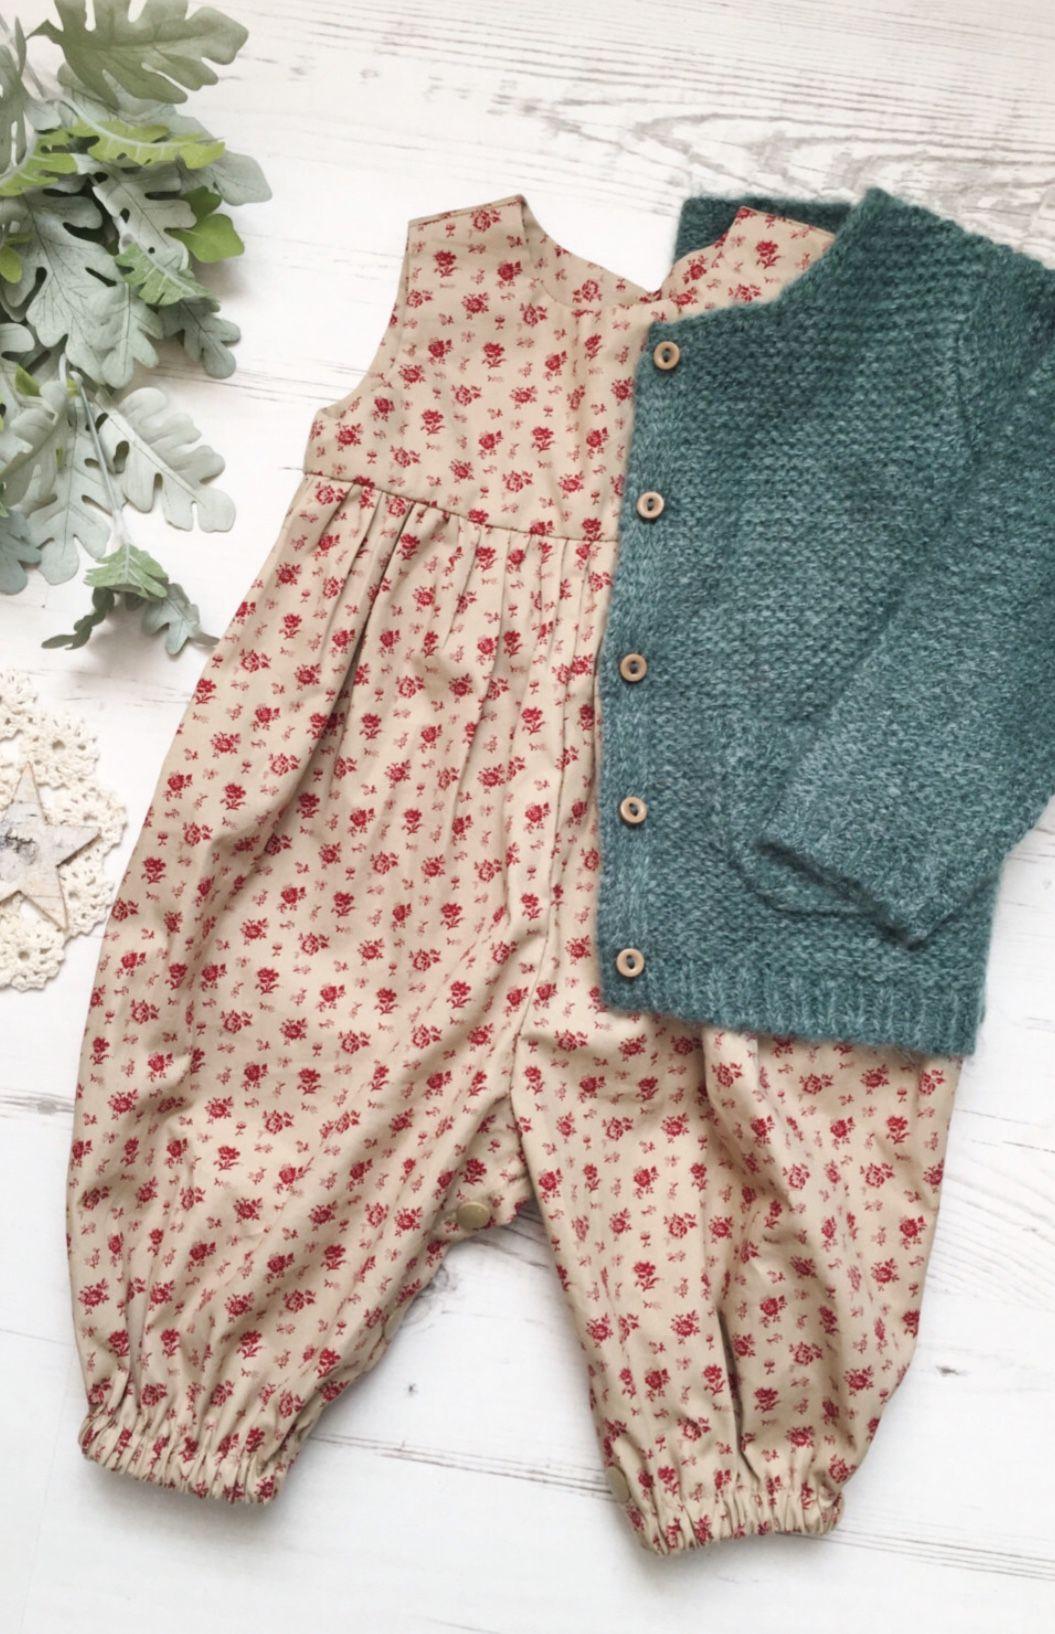 Handmade Vintage Style Floral Romper   AshleyRoseMade on Etsy   Baby ...